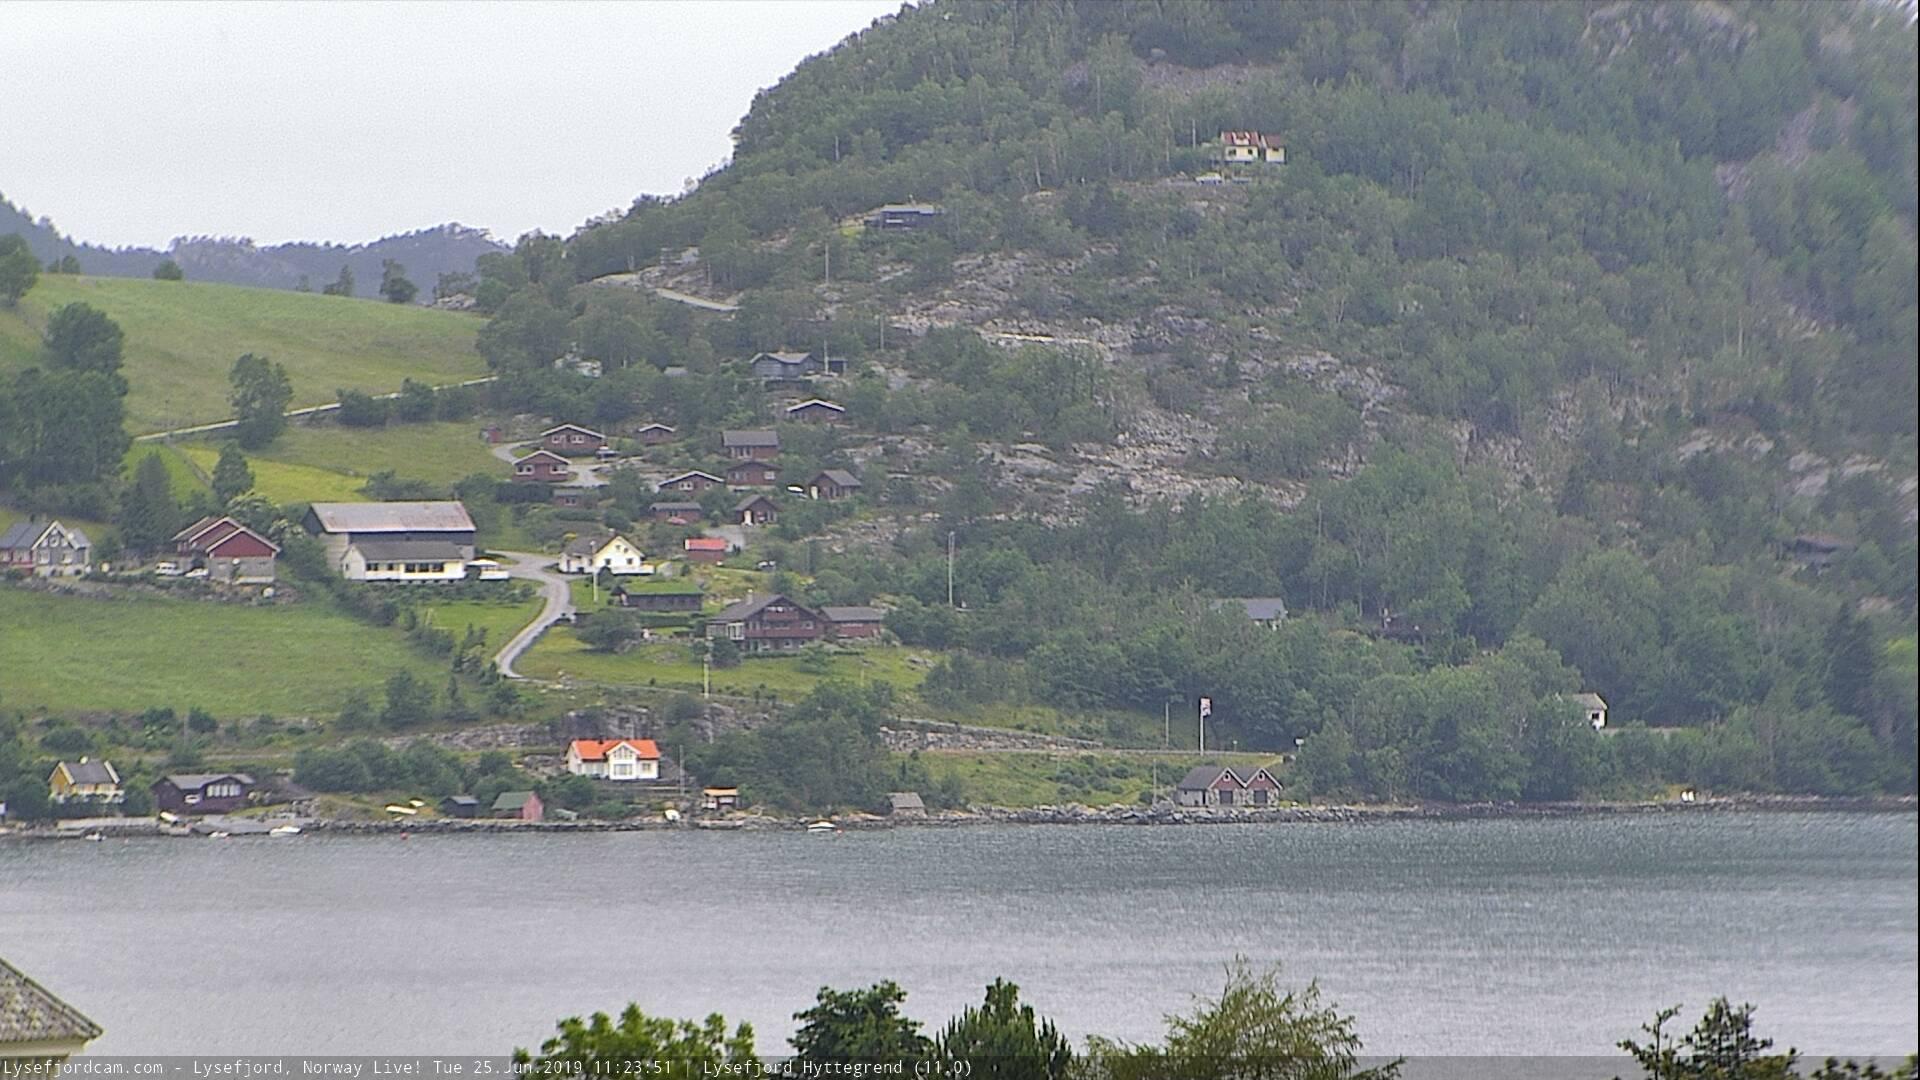 Webkamera Høllesli › North-West: Lysefjord Hyttegrend